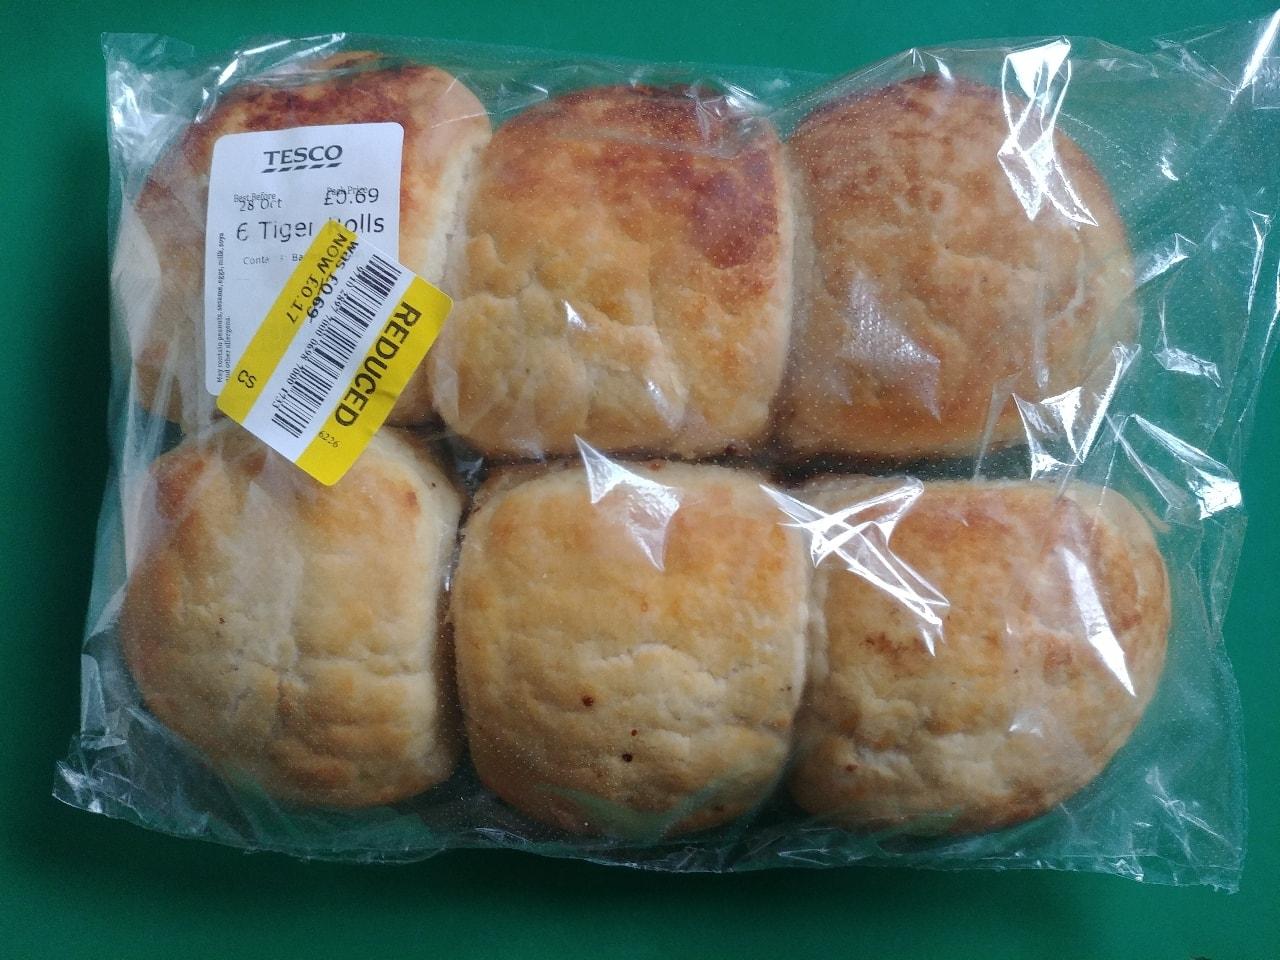 TESCO in store bakery 6 tiger rolls